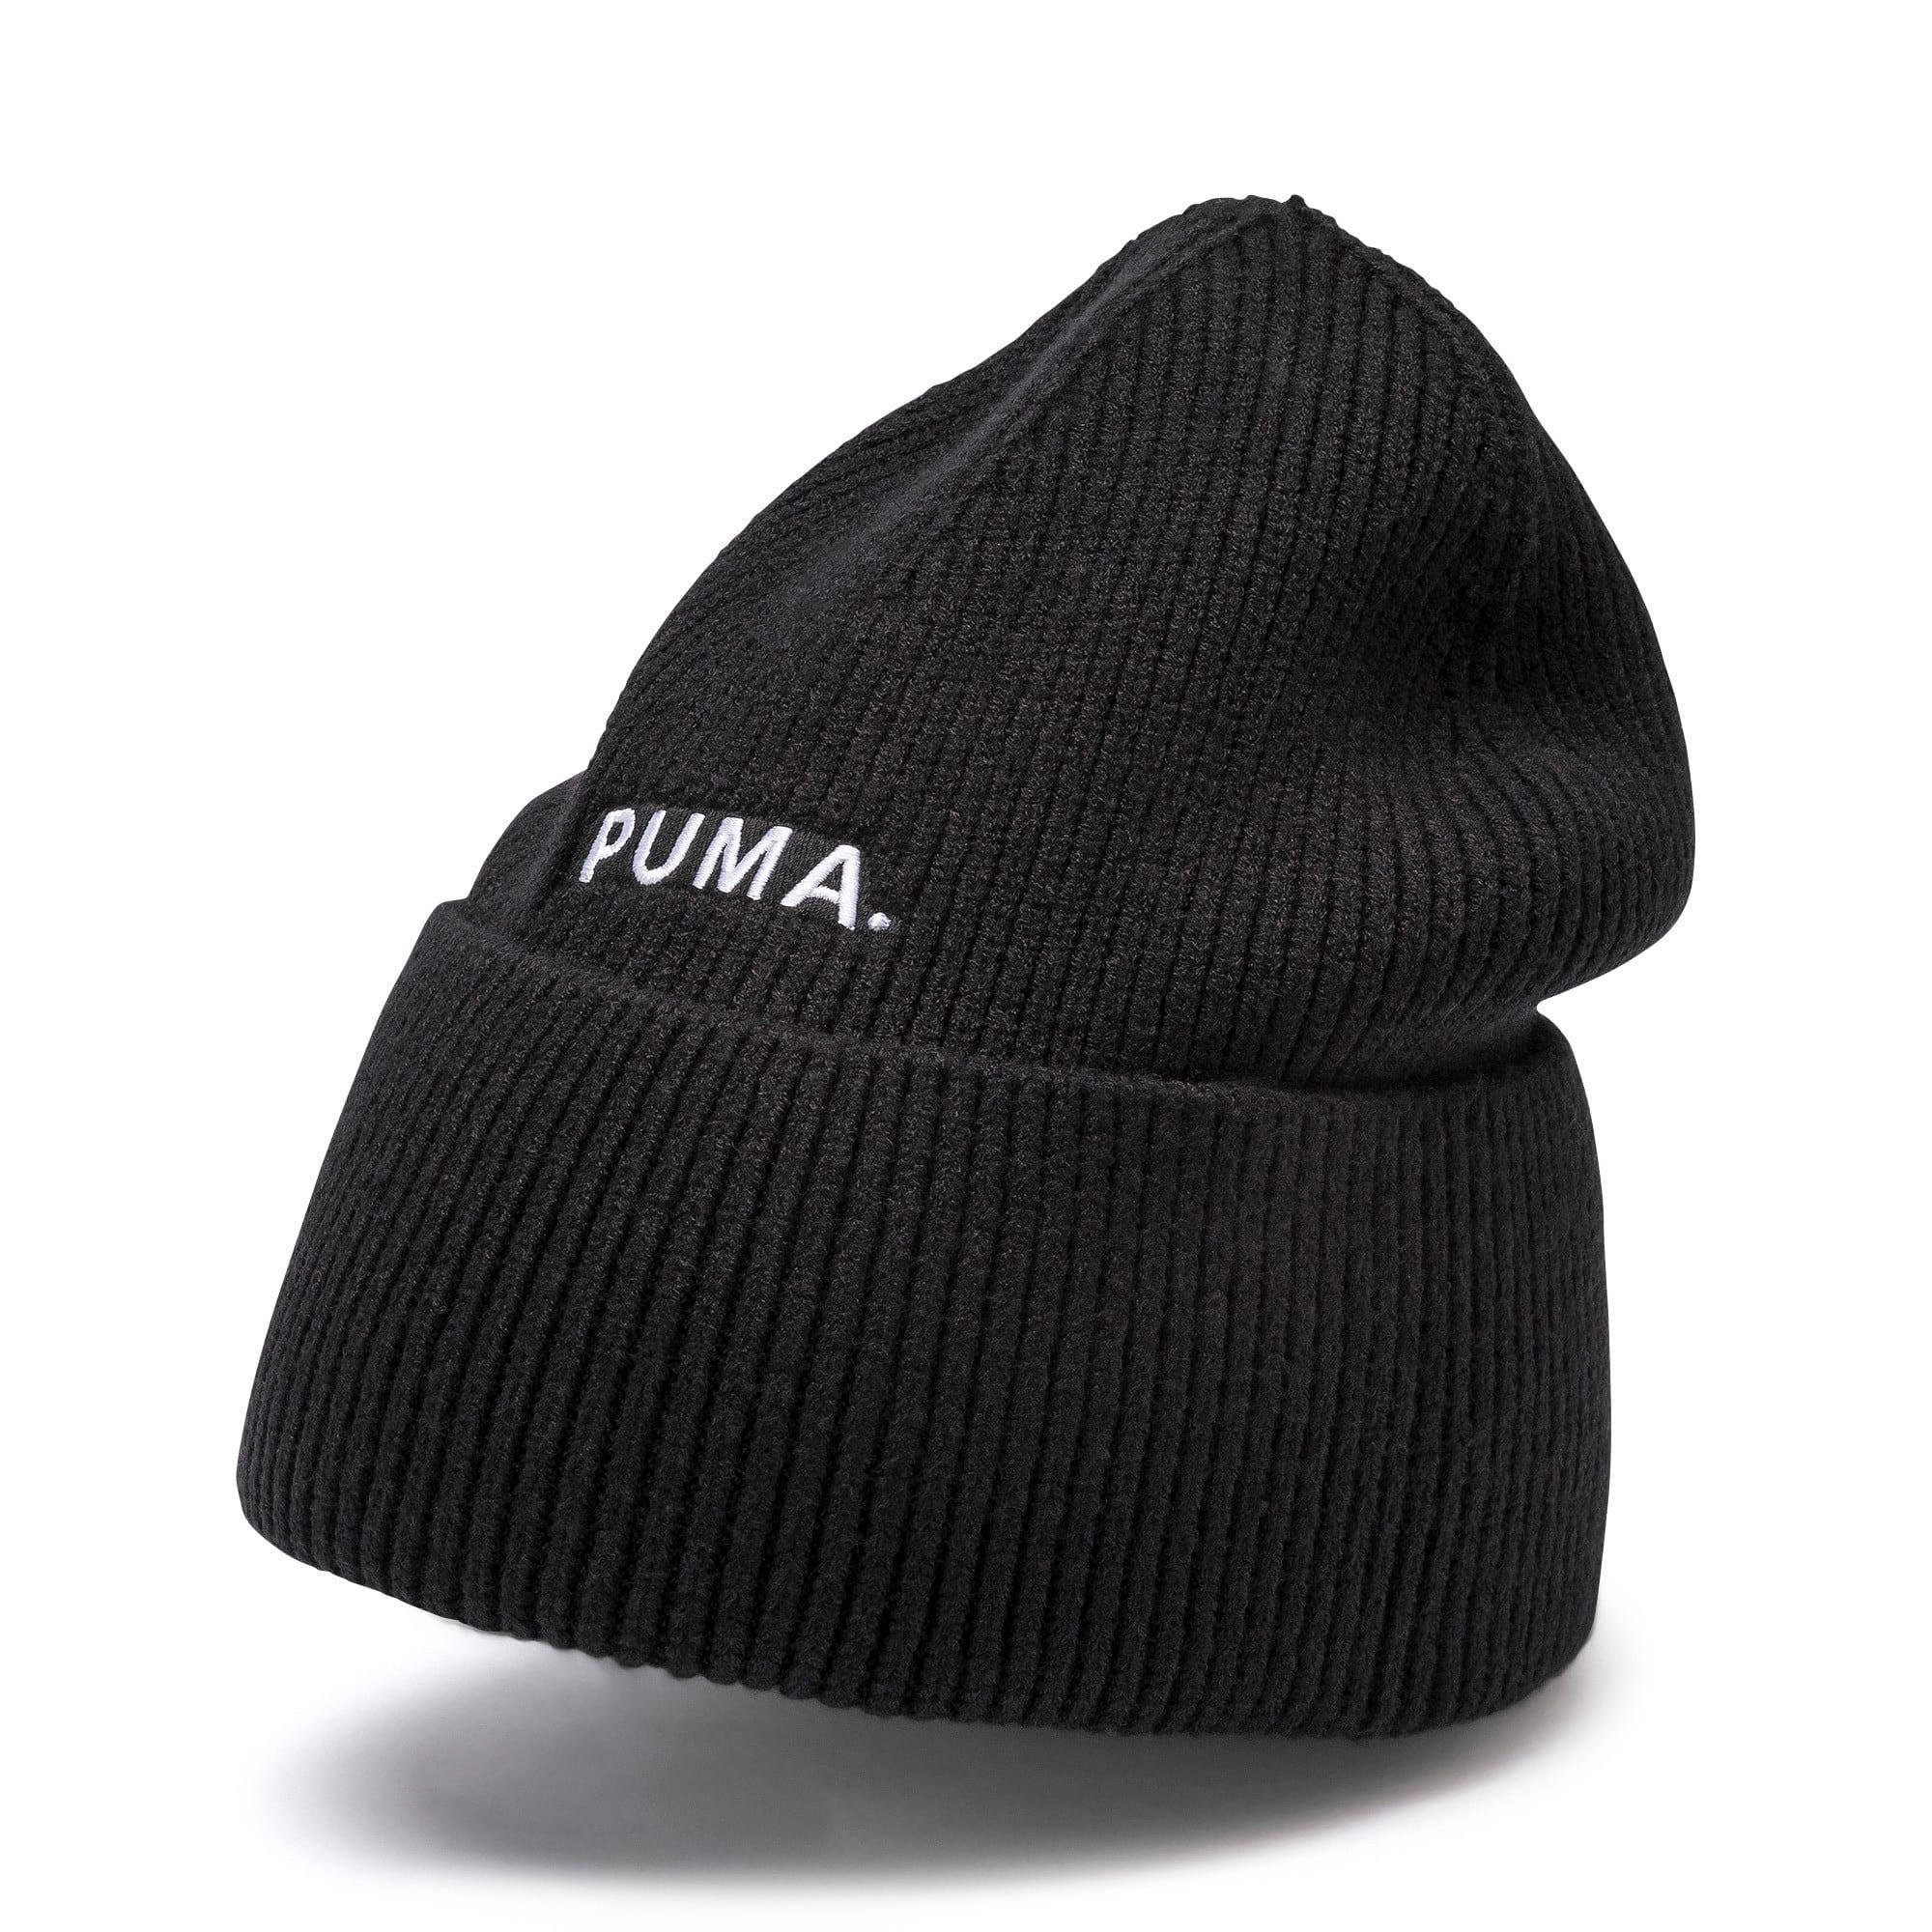 Thumbnail 1 of Hybrid Fit Trend Beanie, Puma Black, medium